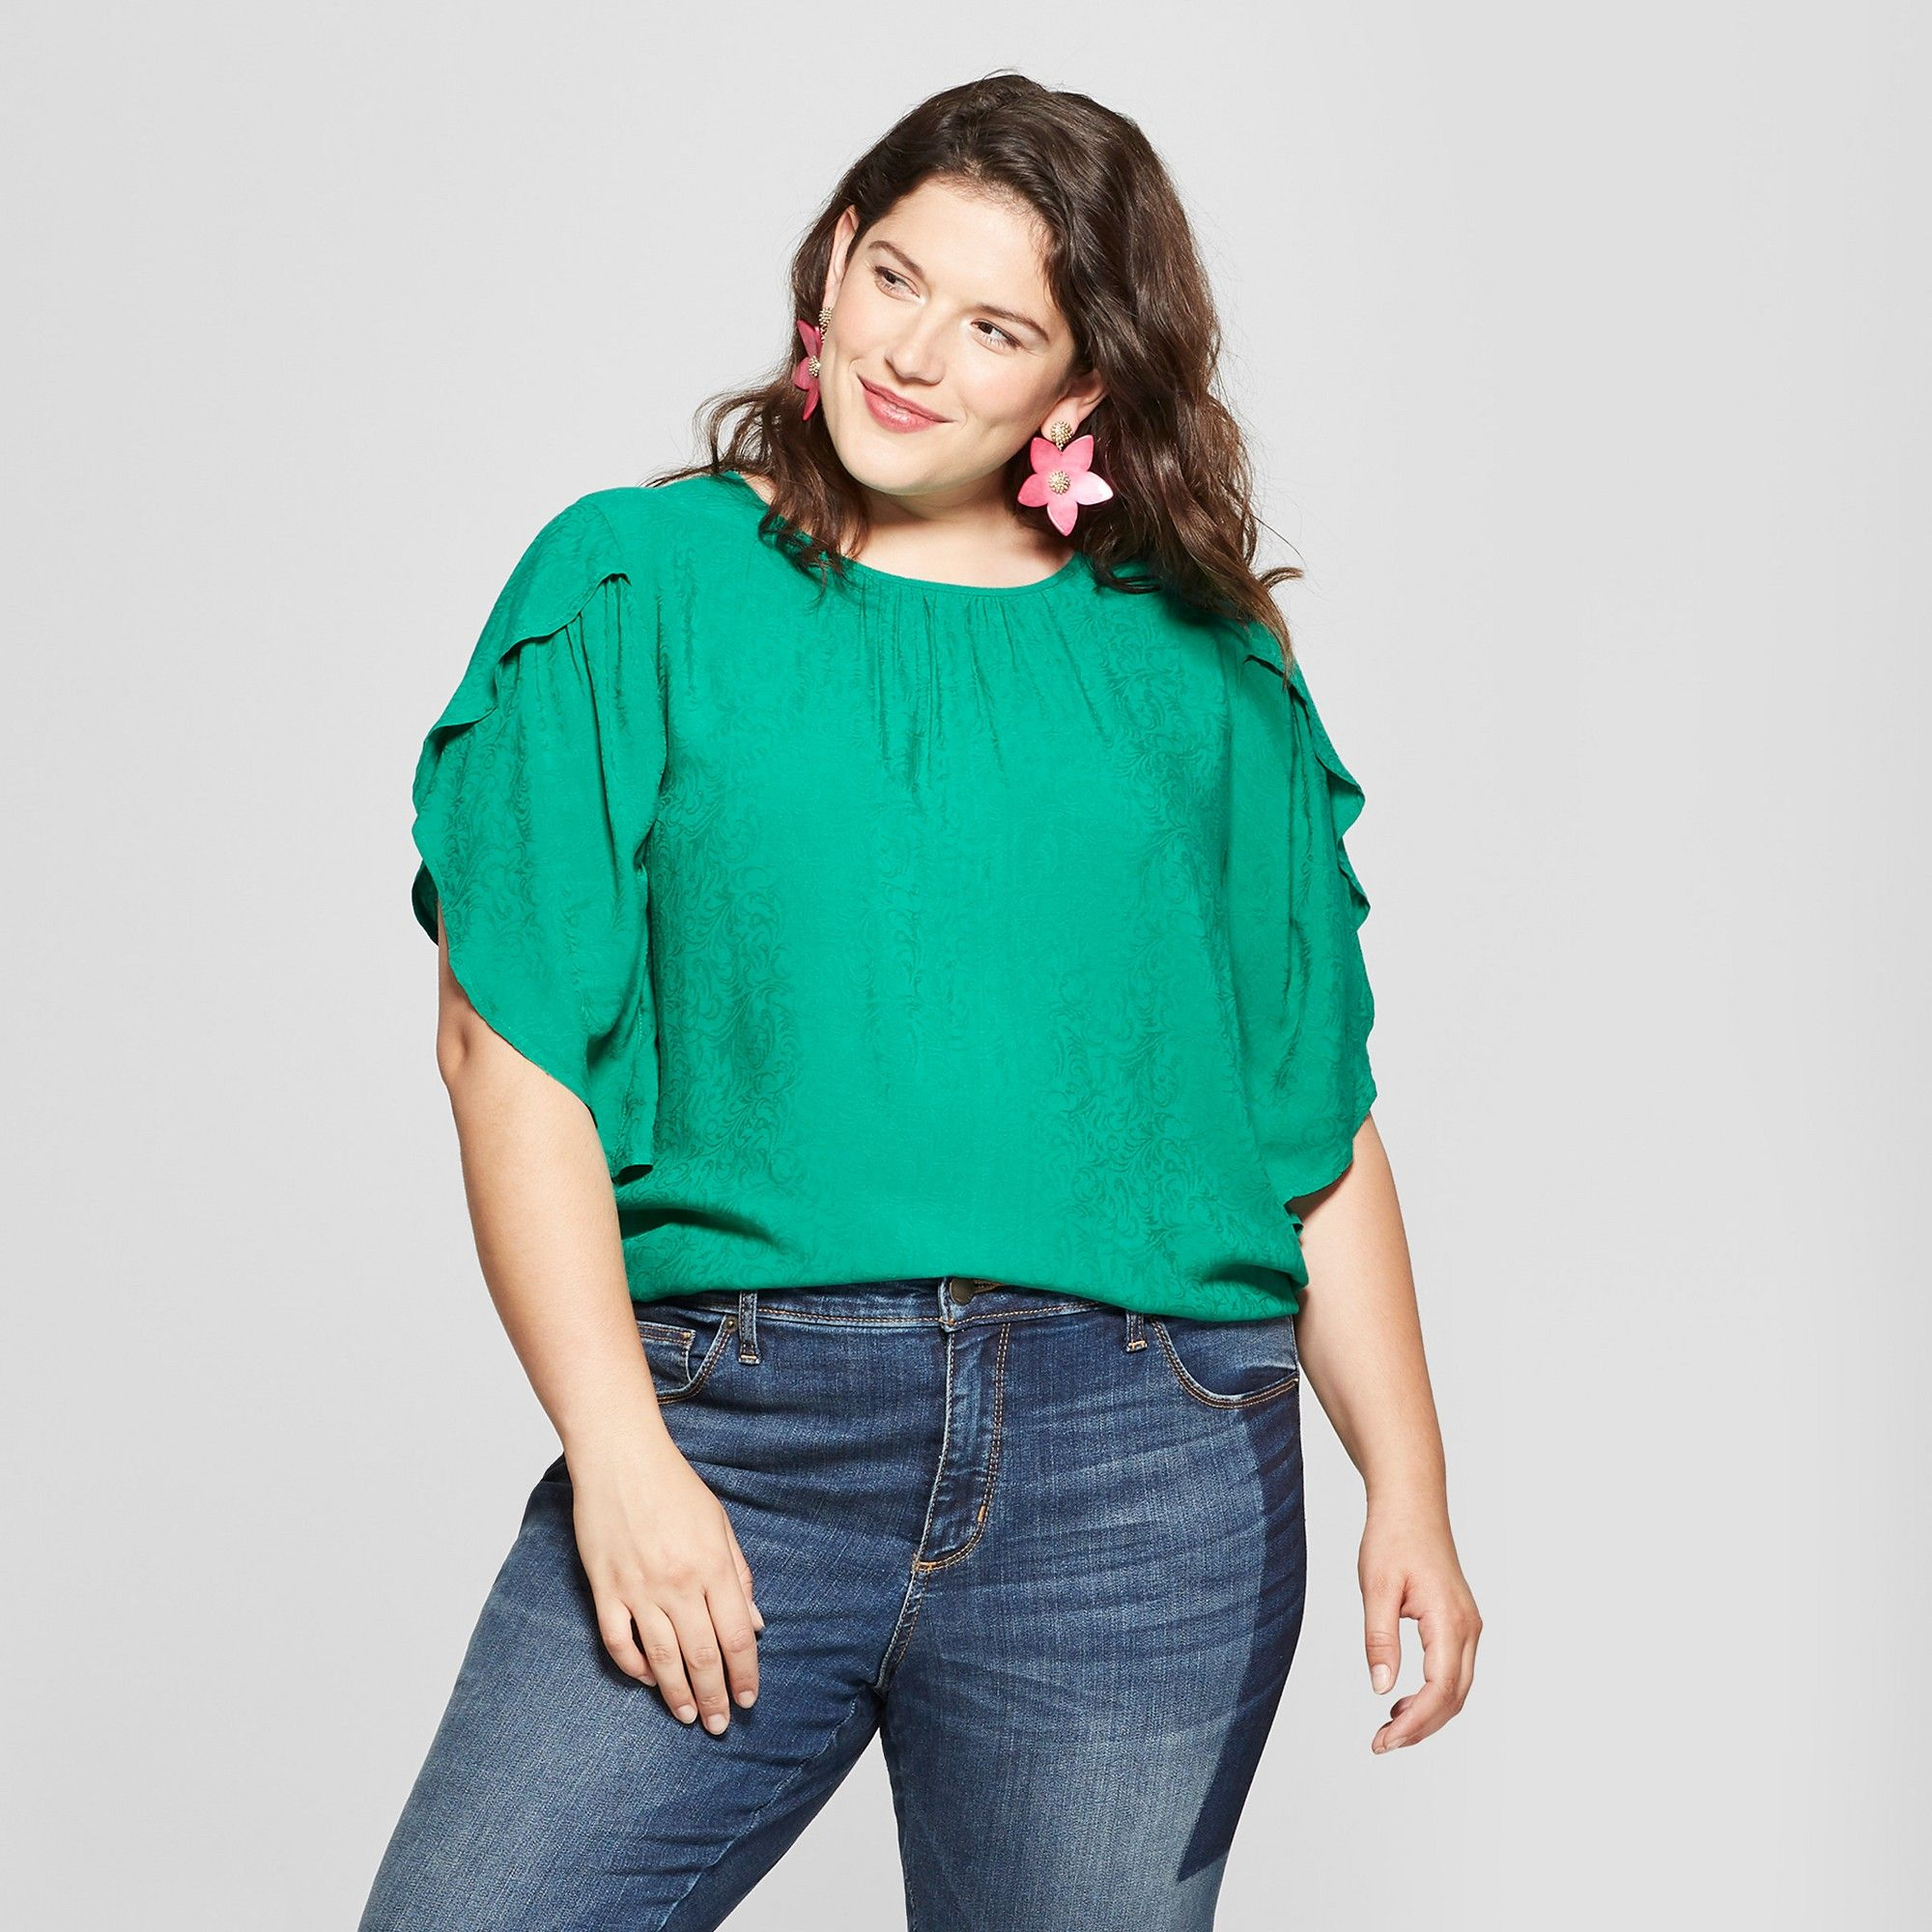 3983d1c9d08 Women s Plus Size Flutter 3 4 Sleeve Blouse - Ava   Viv Green 4X ...